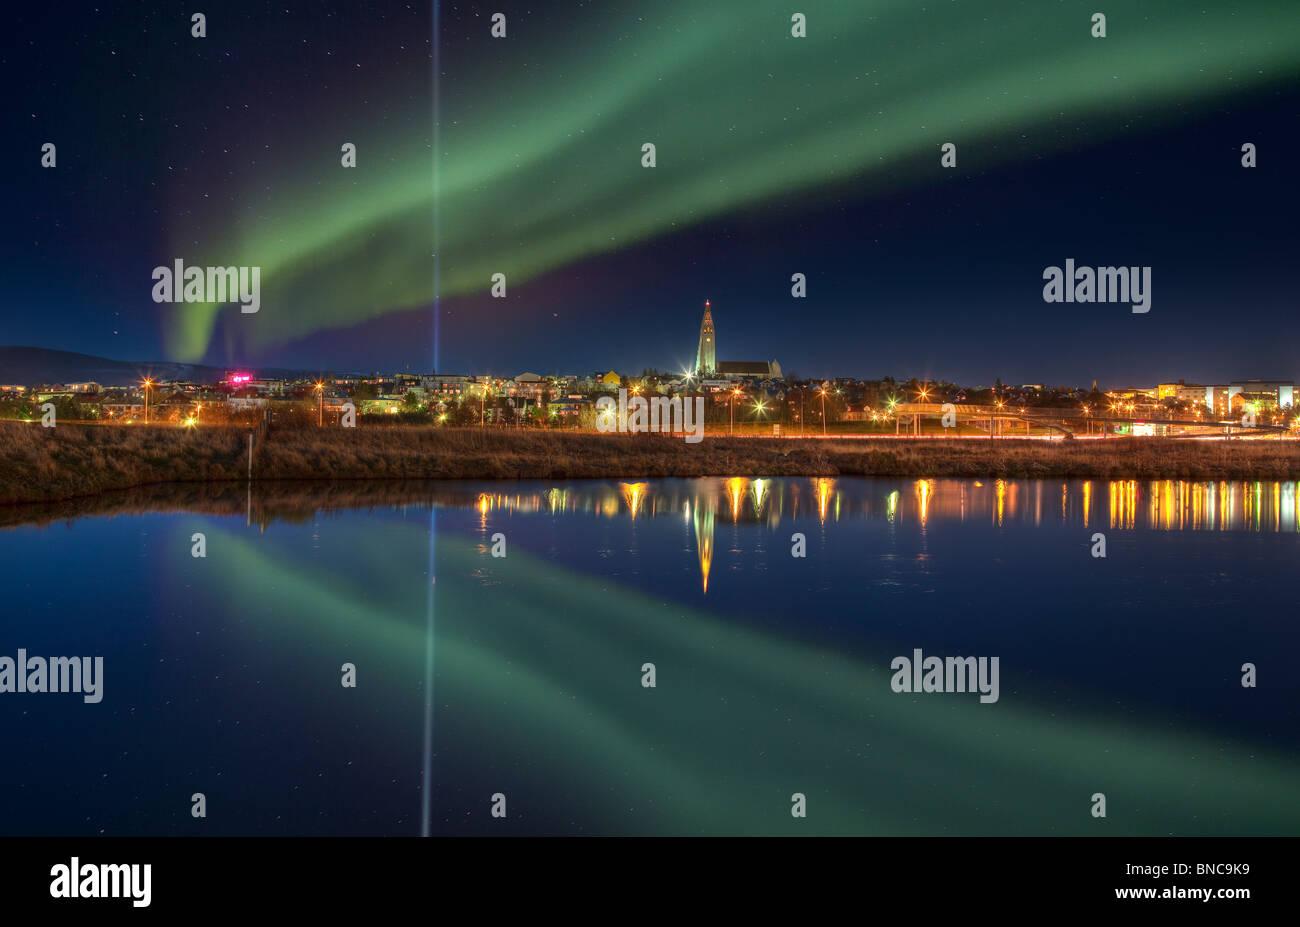 Imagine Peace Tower light and Aurora Borealis in Reykjavik, Iceland - Stock Image